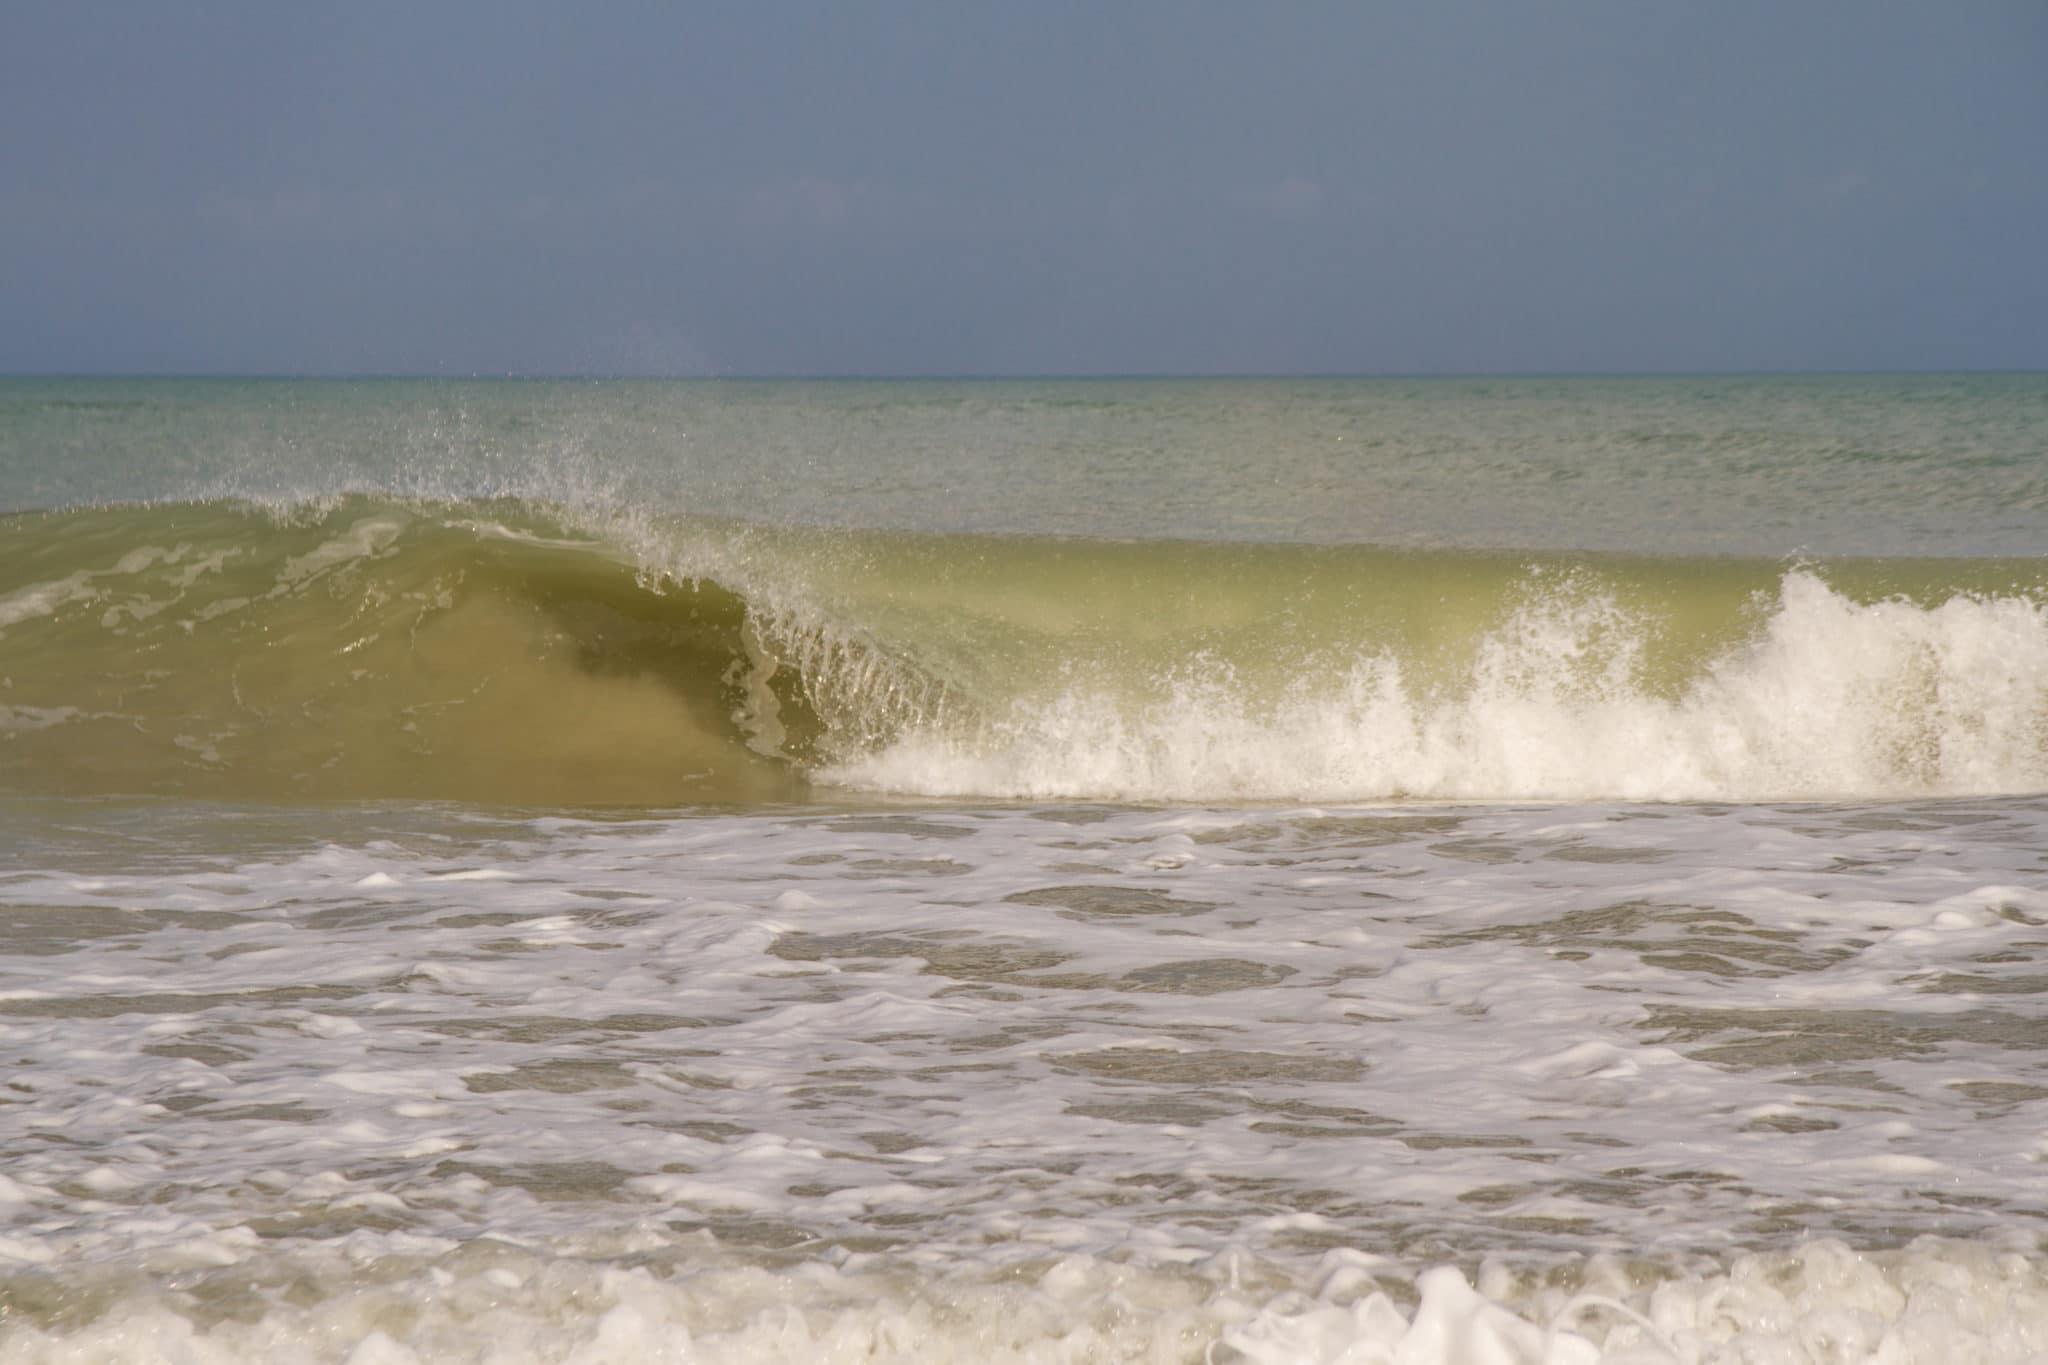 Waves crashing by vero beach photographer